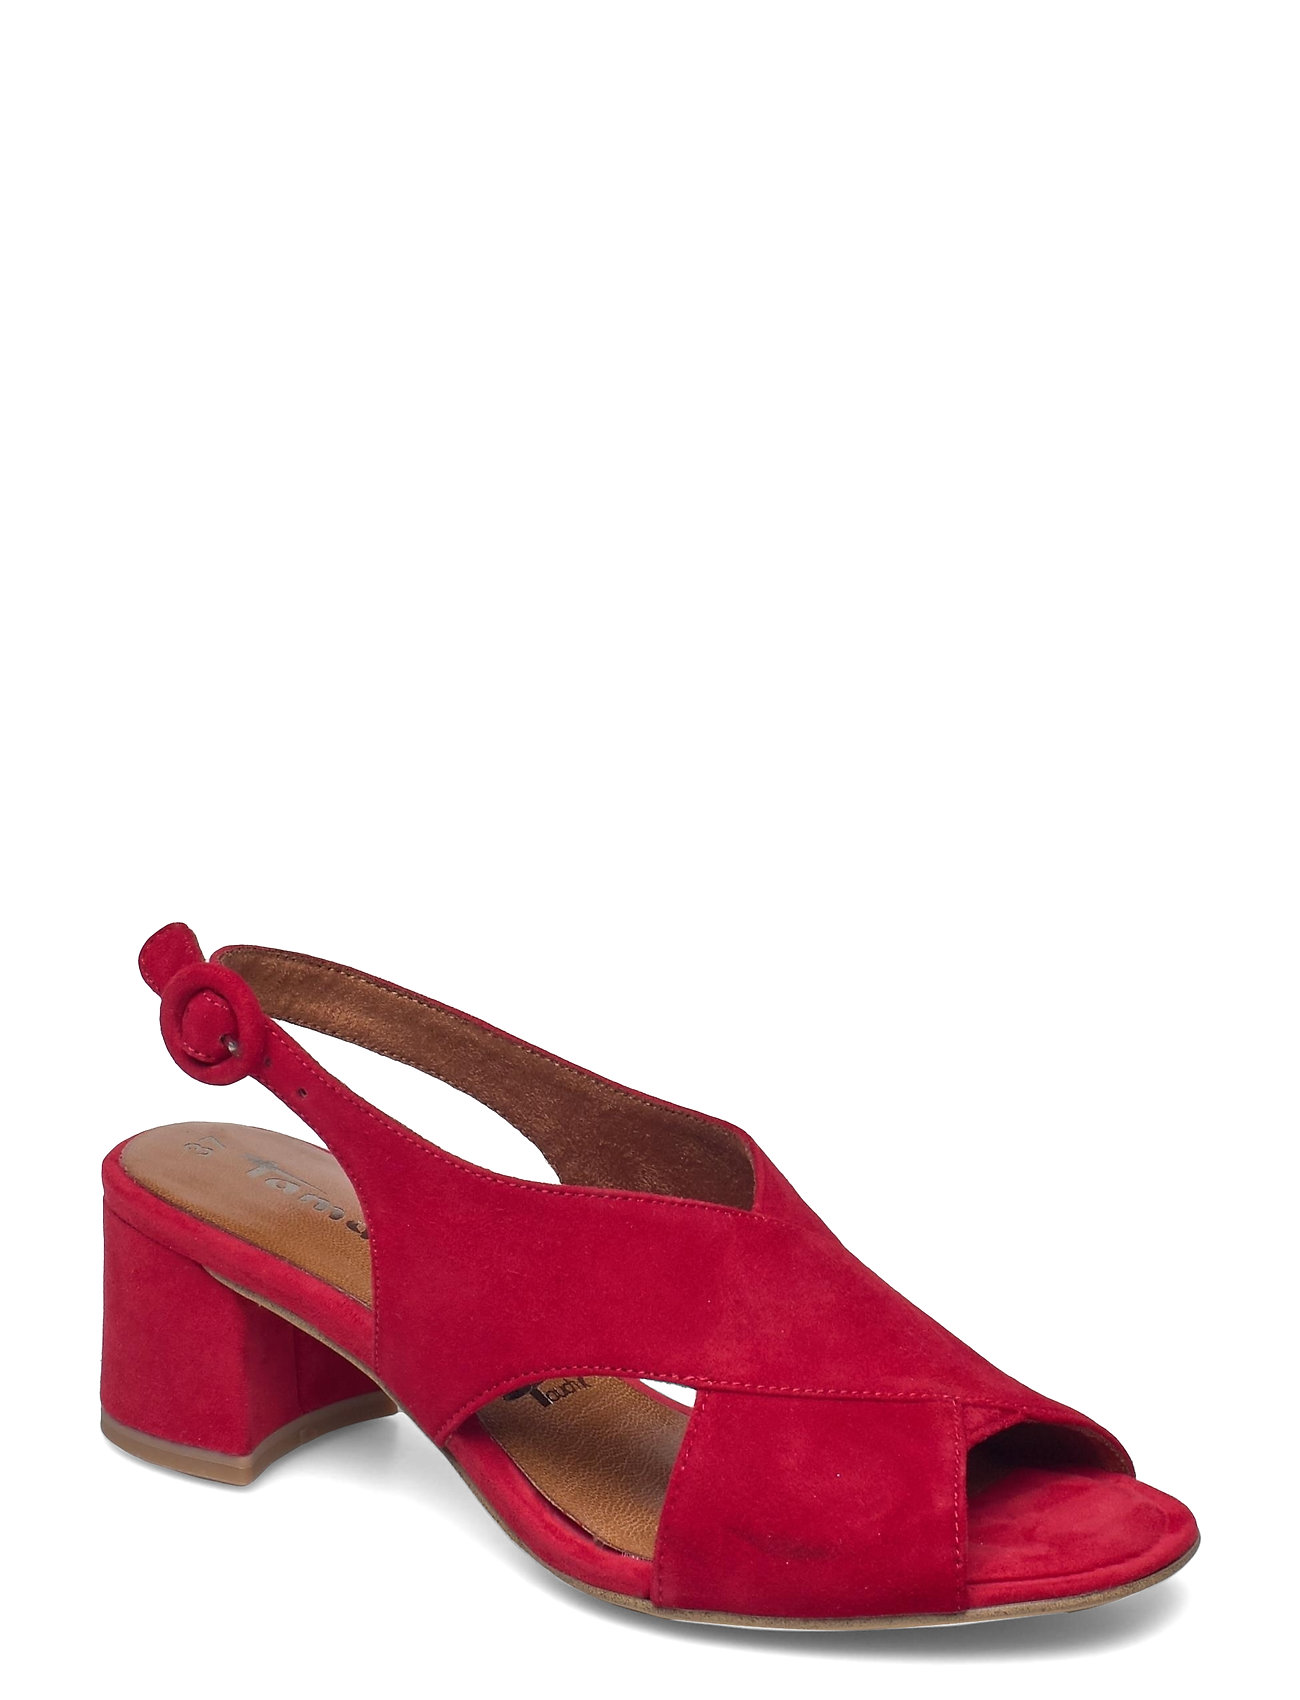 Woms Sandals Shoes Heels Pumps Sling Backs Rød Tamaris